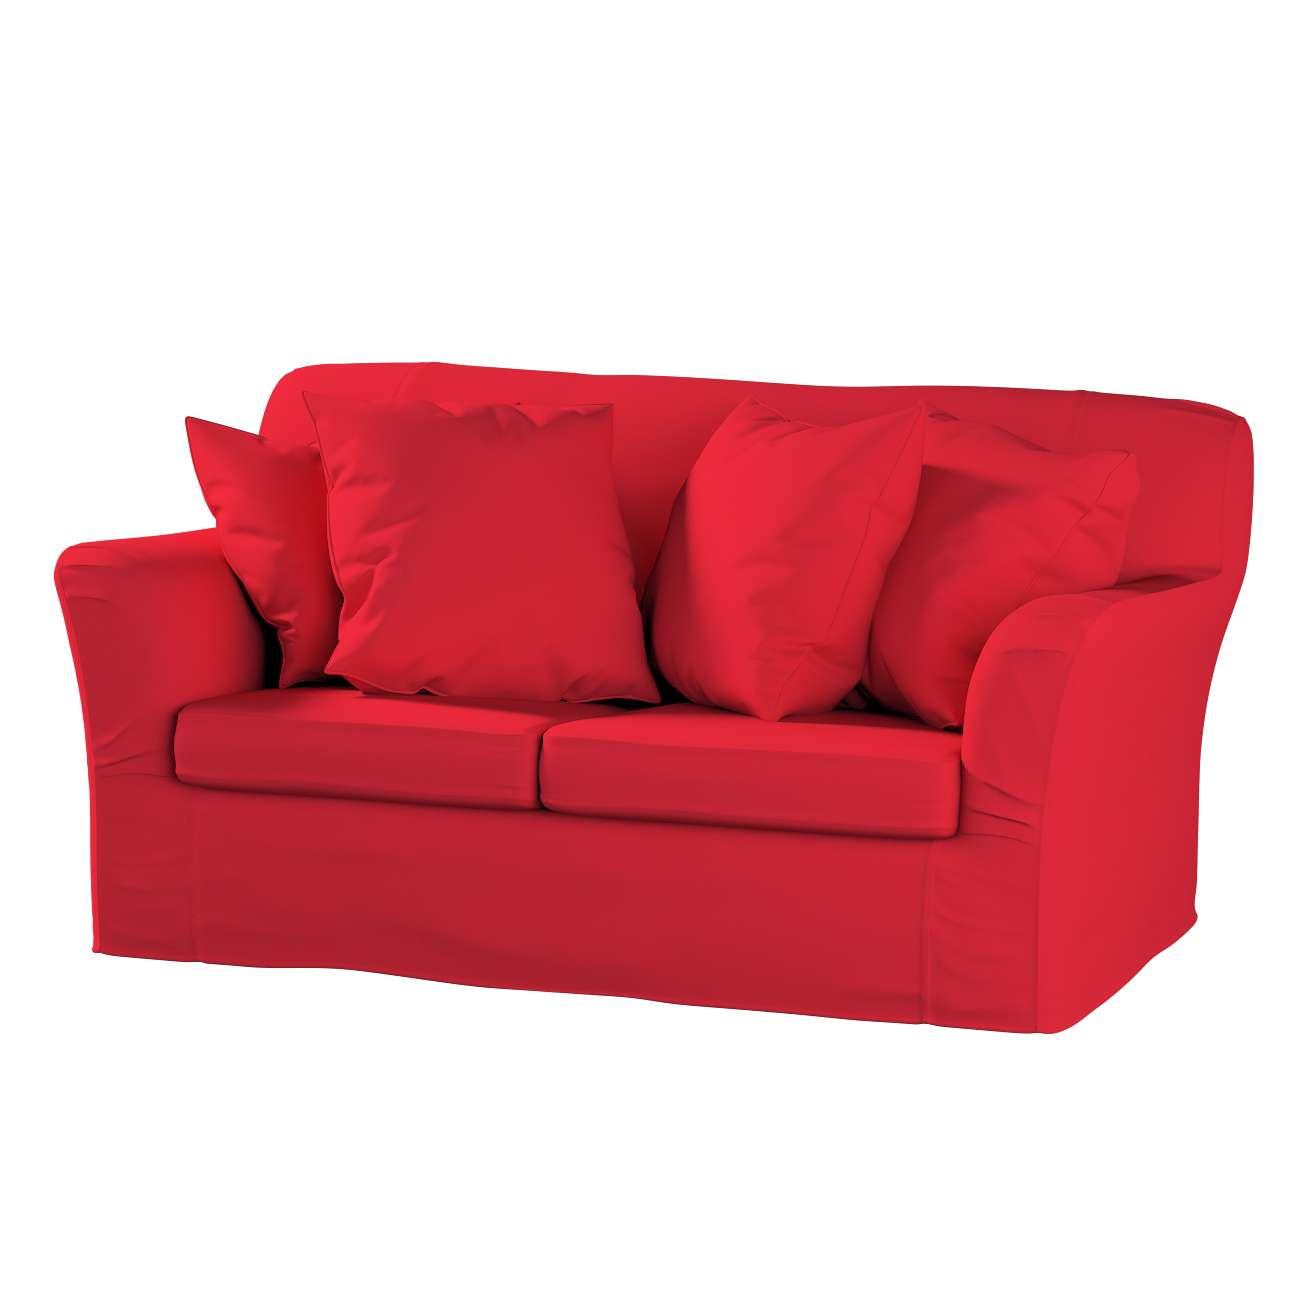 Tomelilla 2-seater sofa cover in collection Panama Cotton, fabric: 702-04